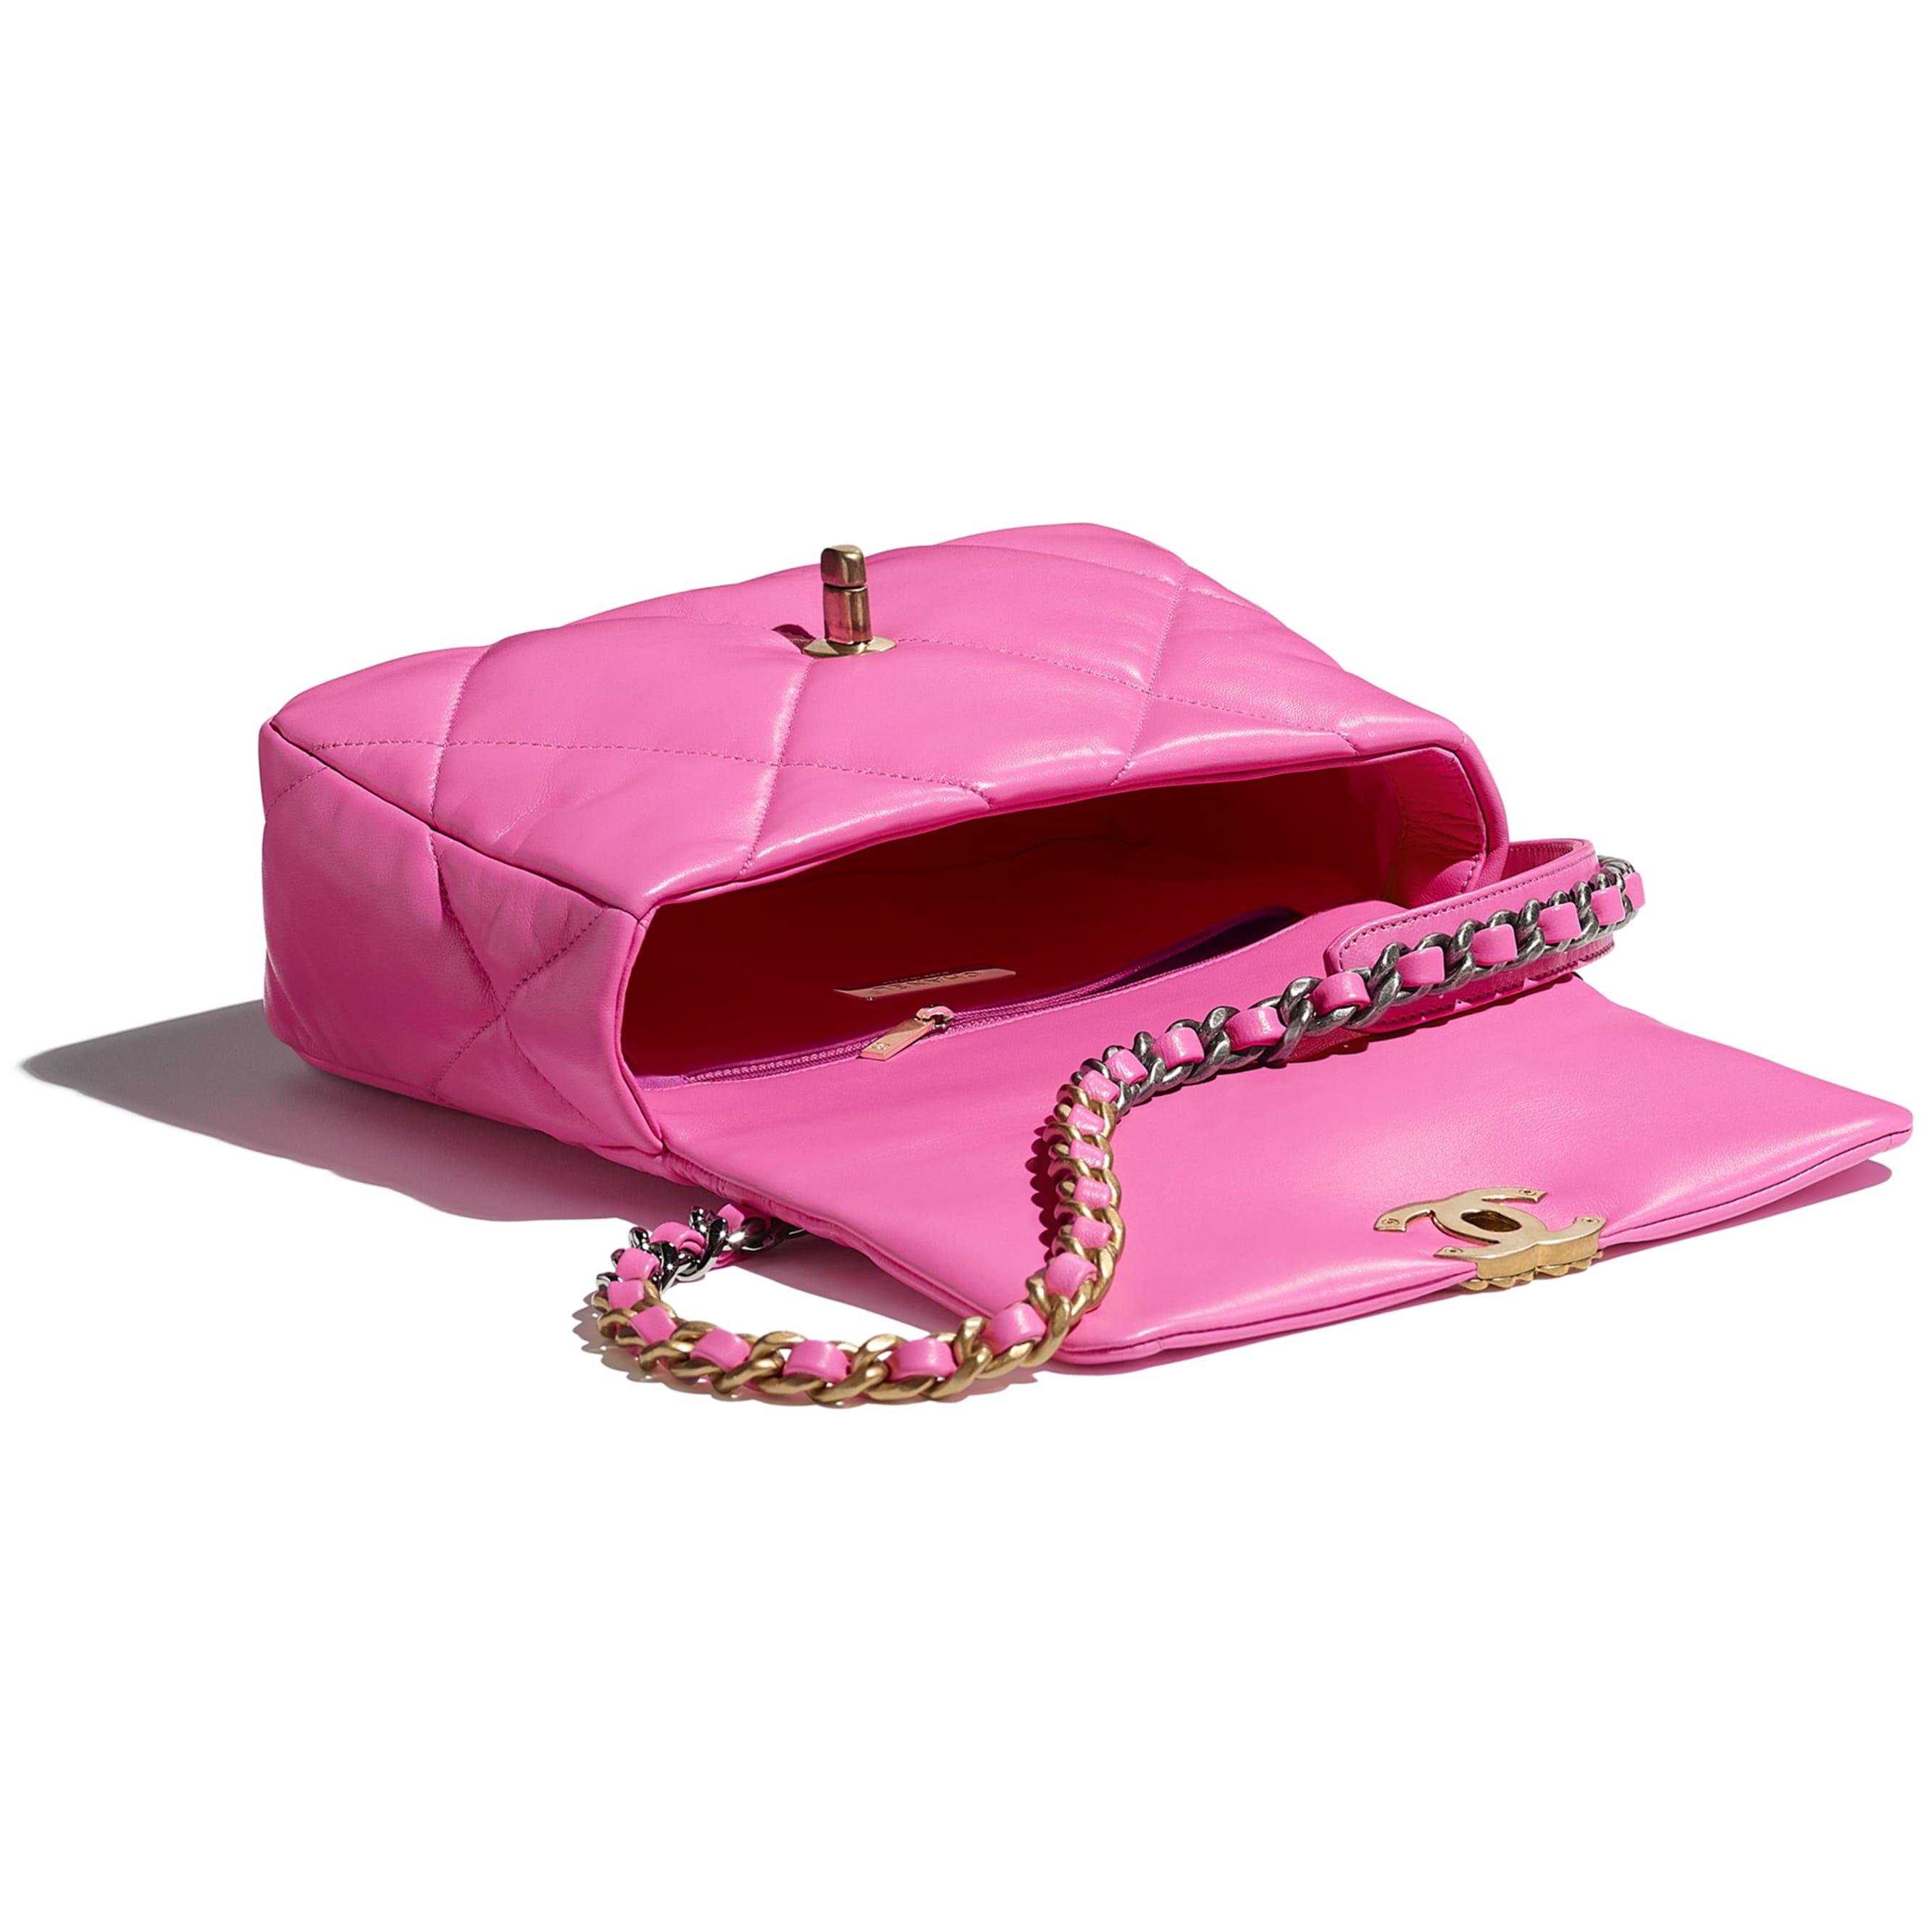 CHANEL 19 口蓋包 - 螢光粉紅 - 亮面小羊皮、金色、銀色&釕色金屬 - CHANEL - 其他視圖 - 查看標準尺寸版本